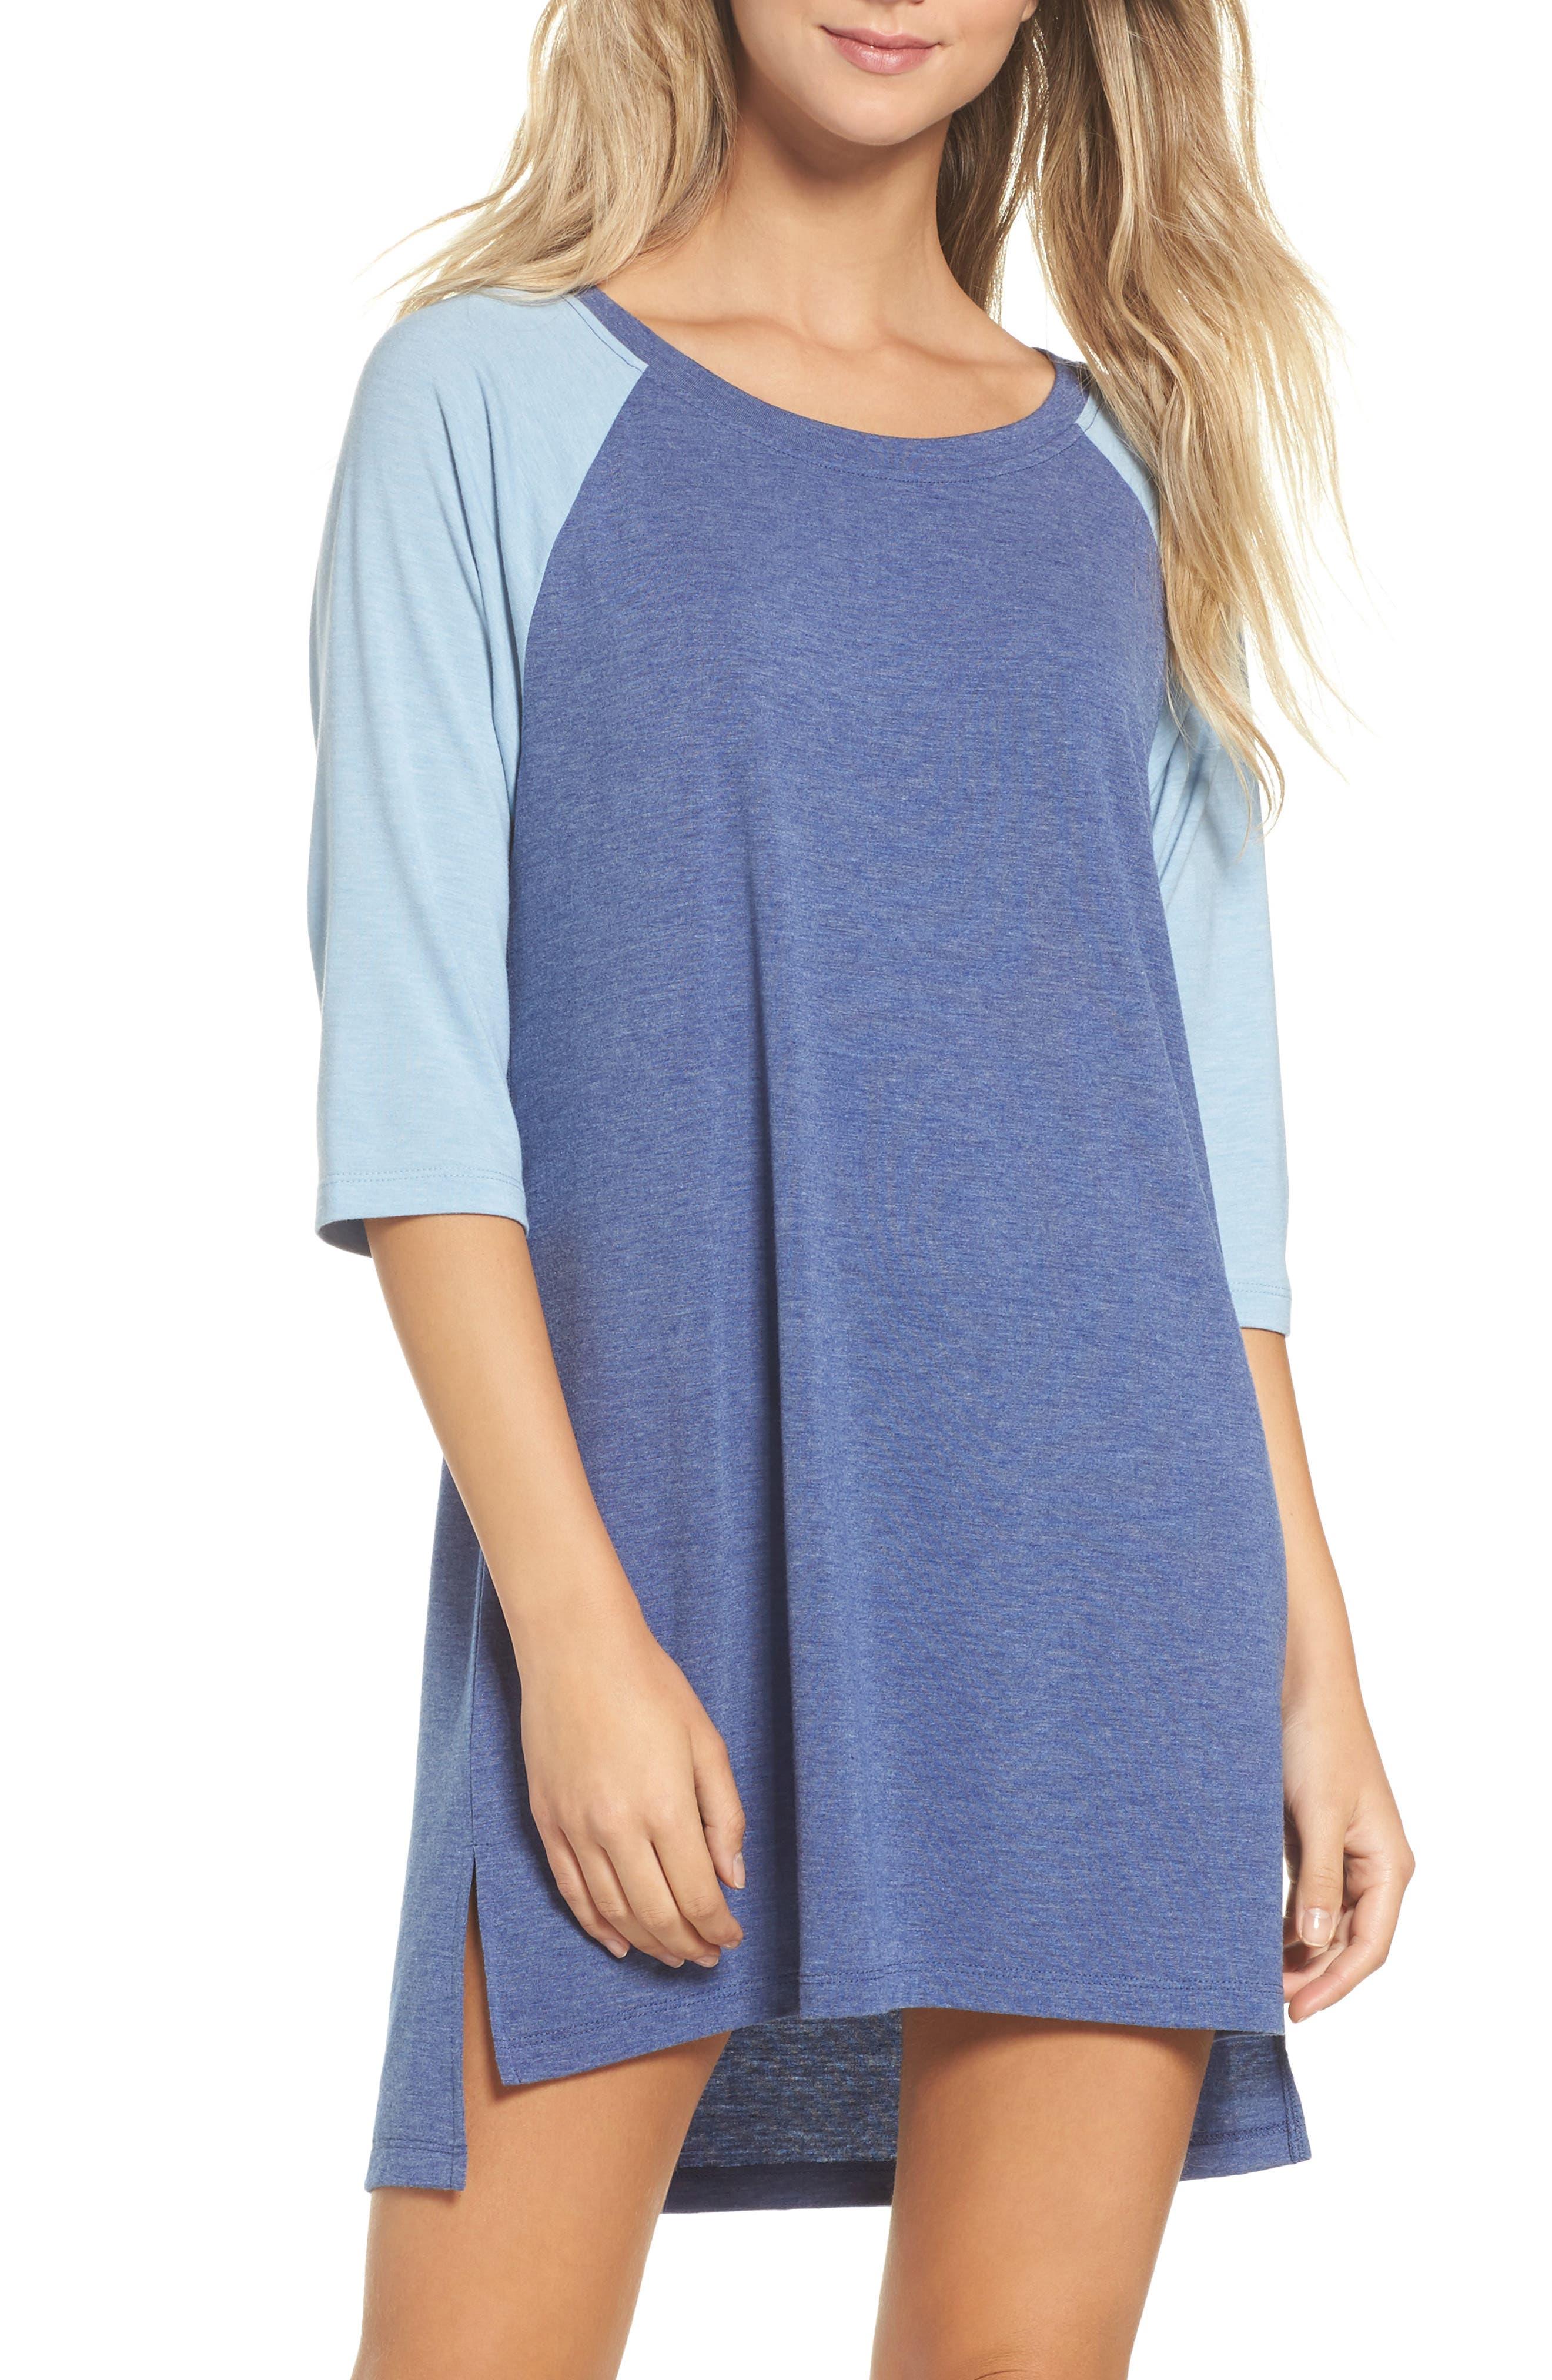 Honeydew All American Sleep Shirt,                             Main thumbnail 4, color,